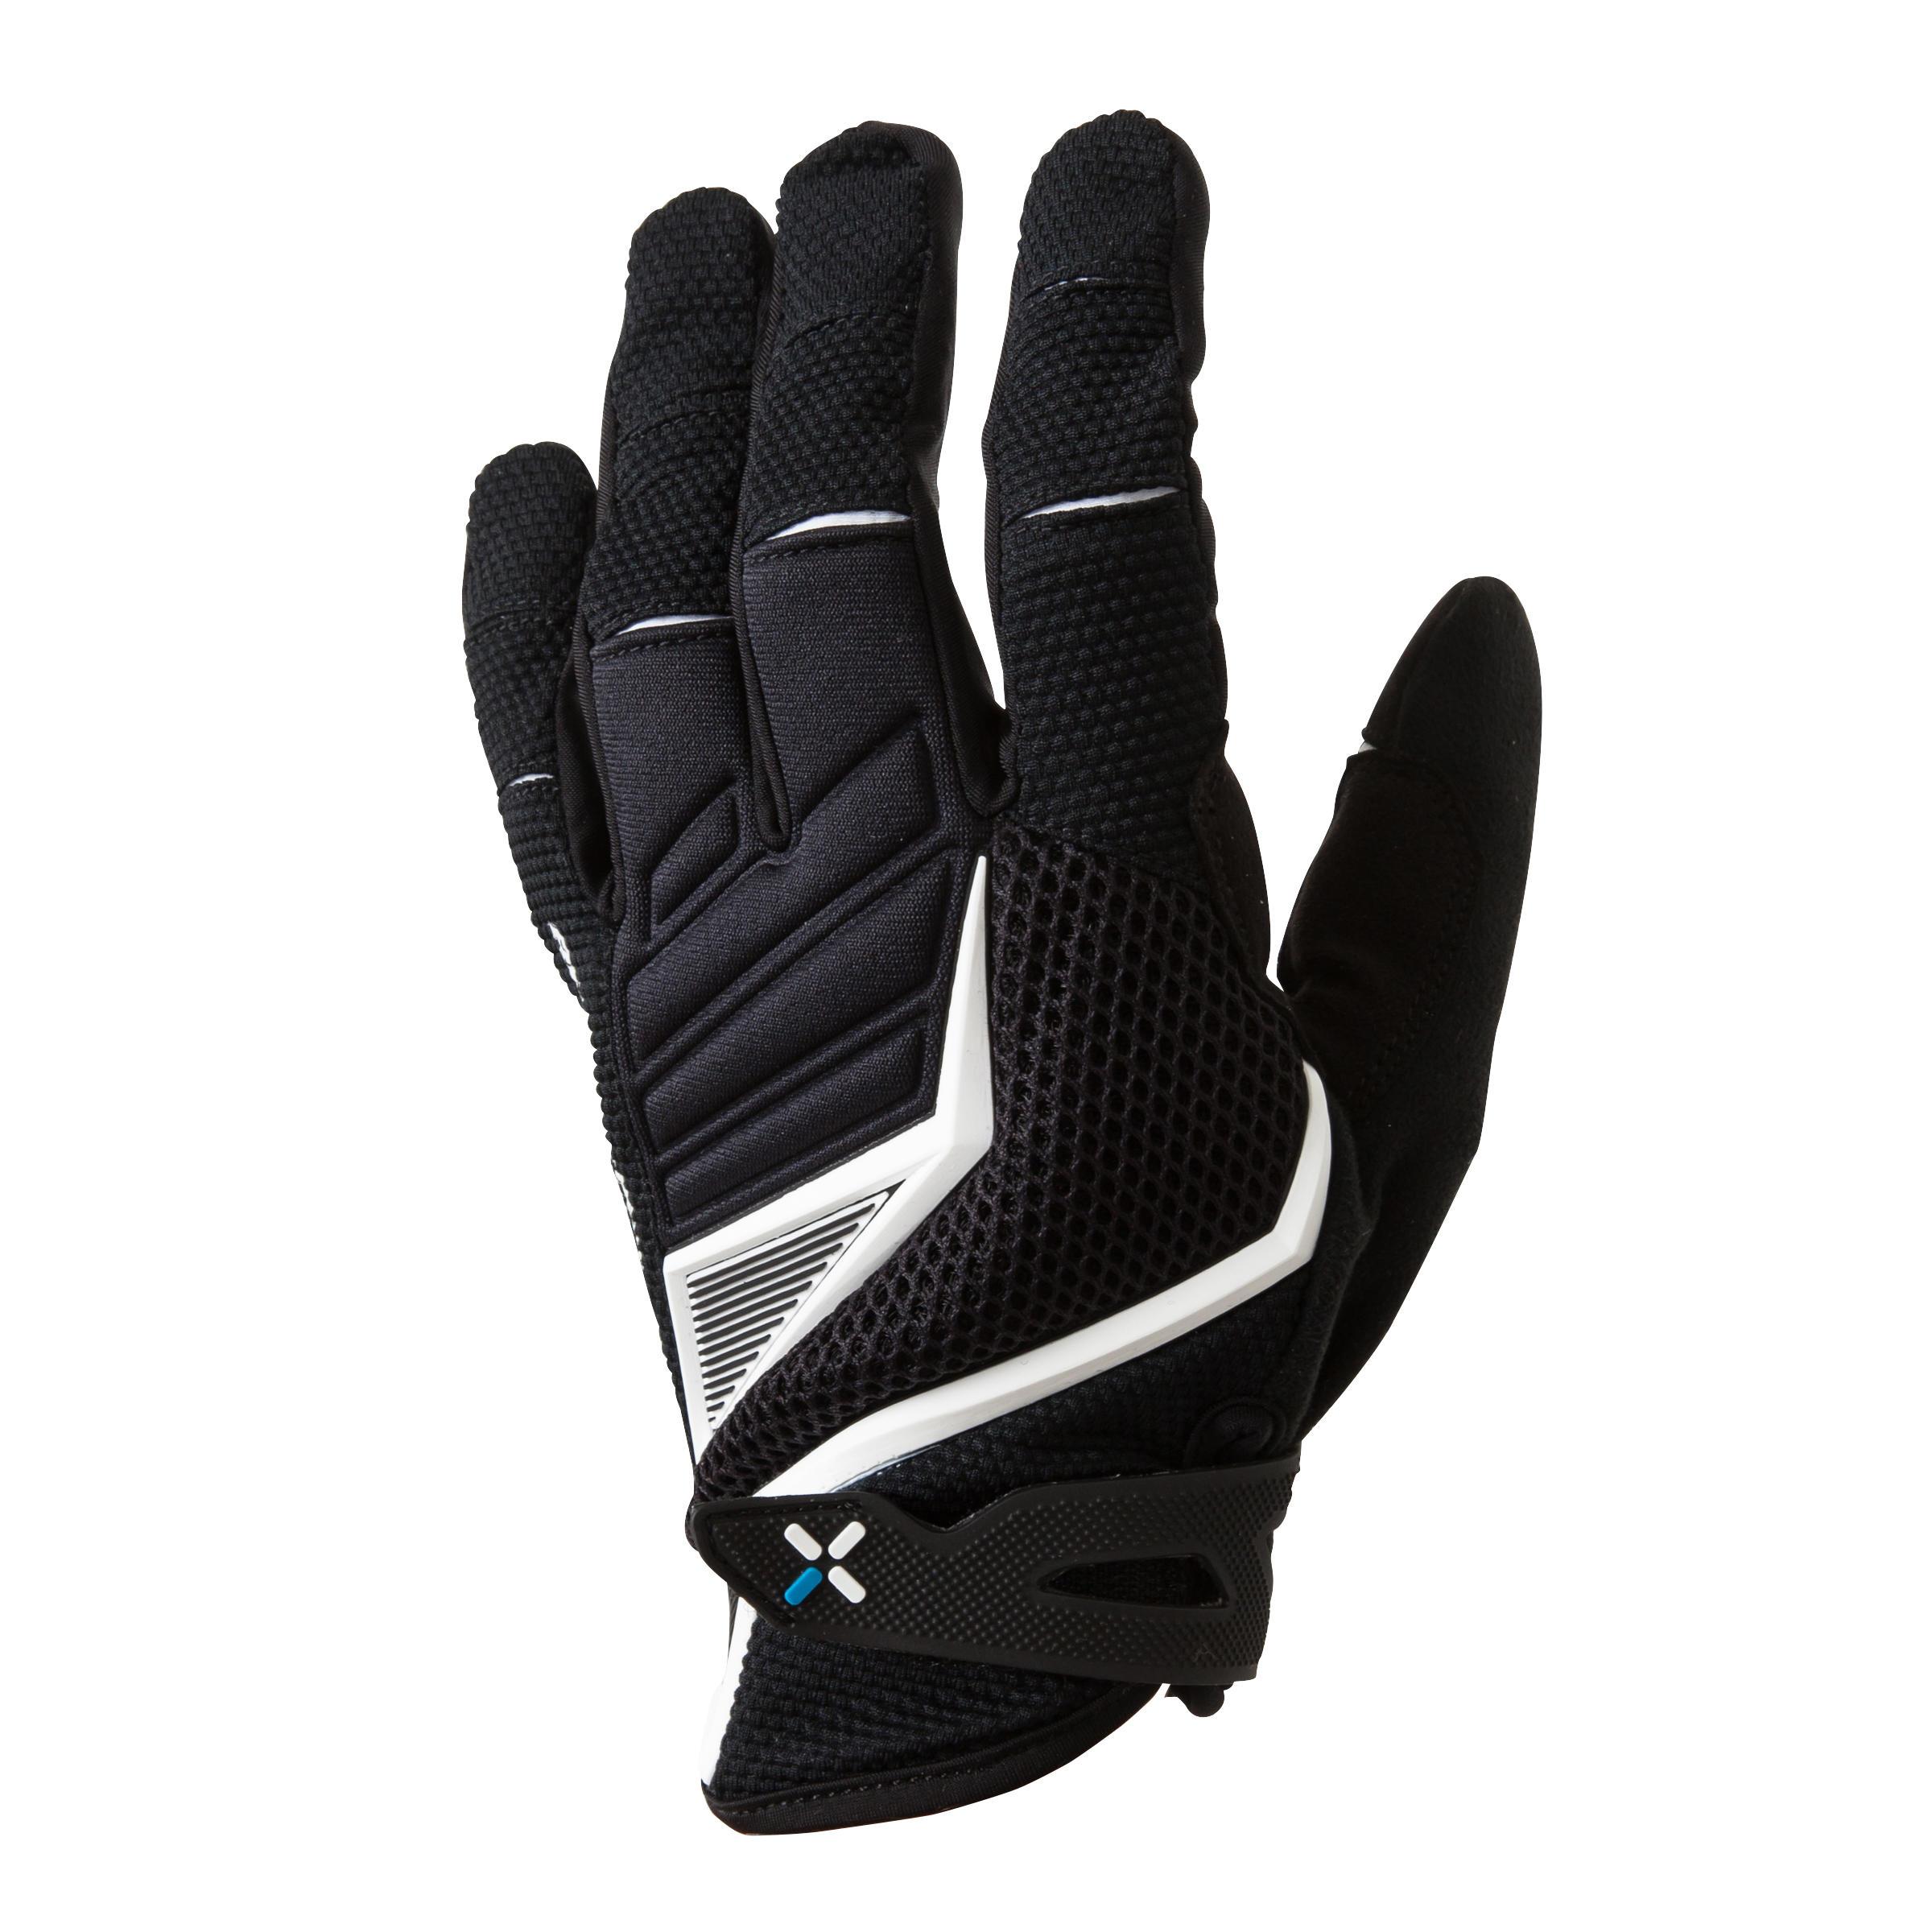 500 AM Mountain Bike Gloves - Black/White